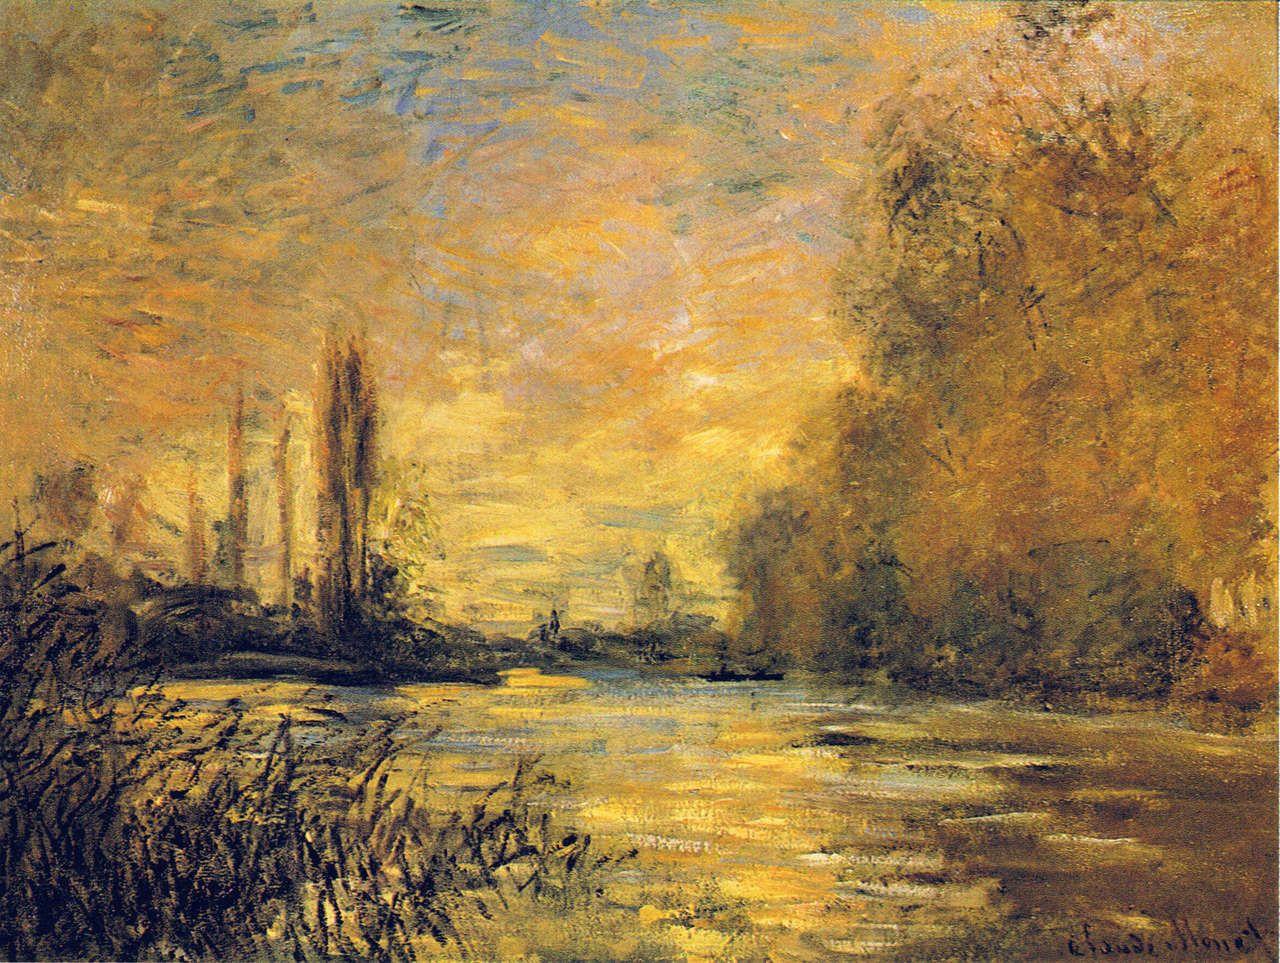 claudemonet-art:  The Small Arm of the Seine at Argenteuil, 1876 Claude Monet